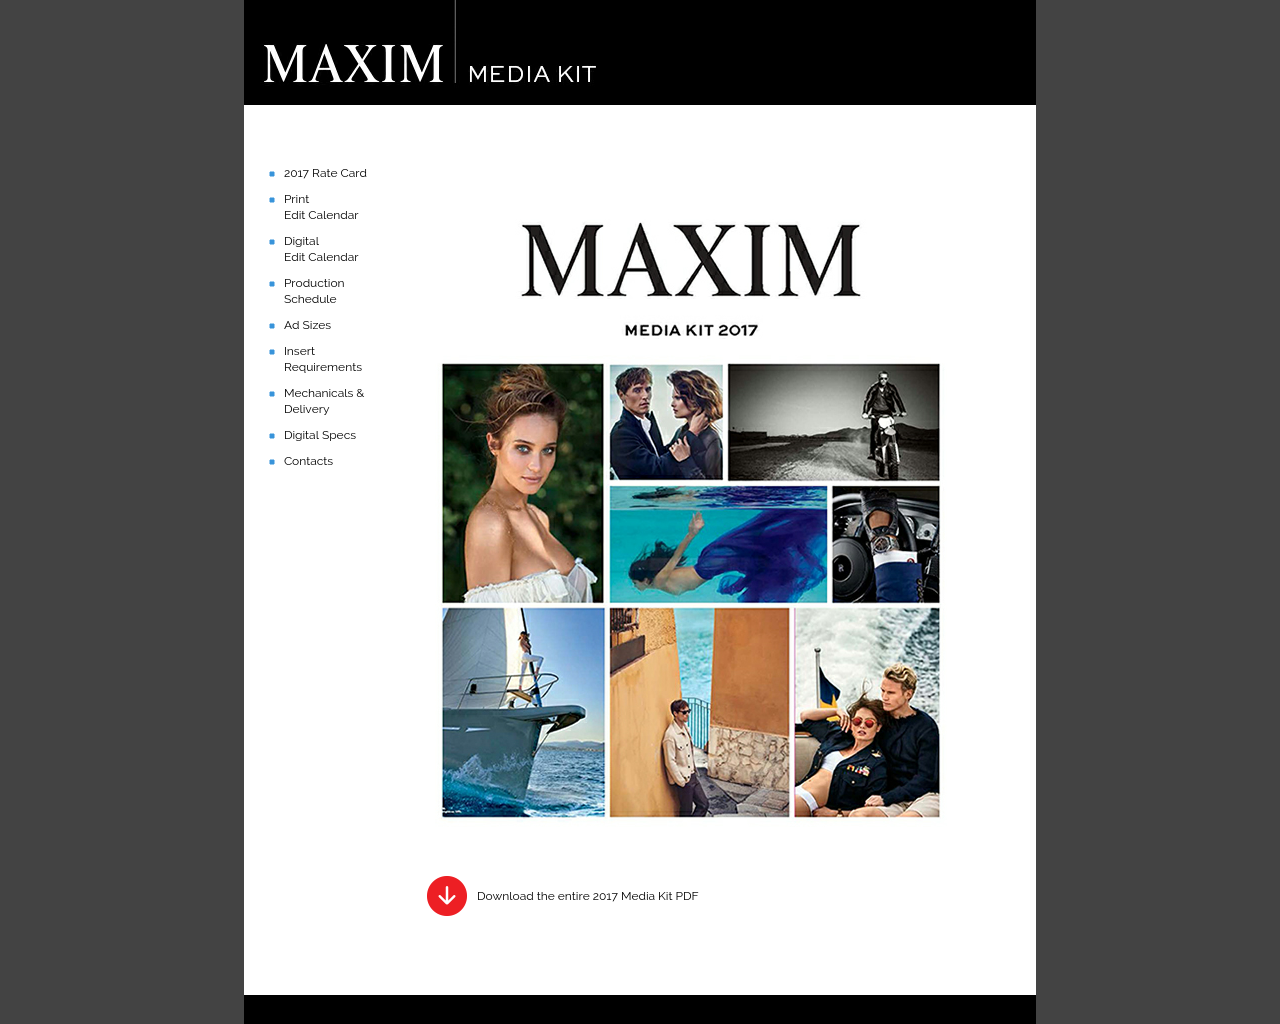 Maxim-Advertising-Reviews-Pricing